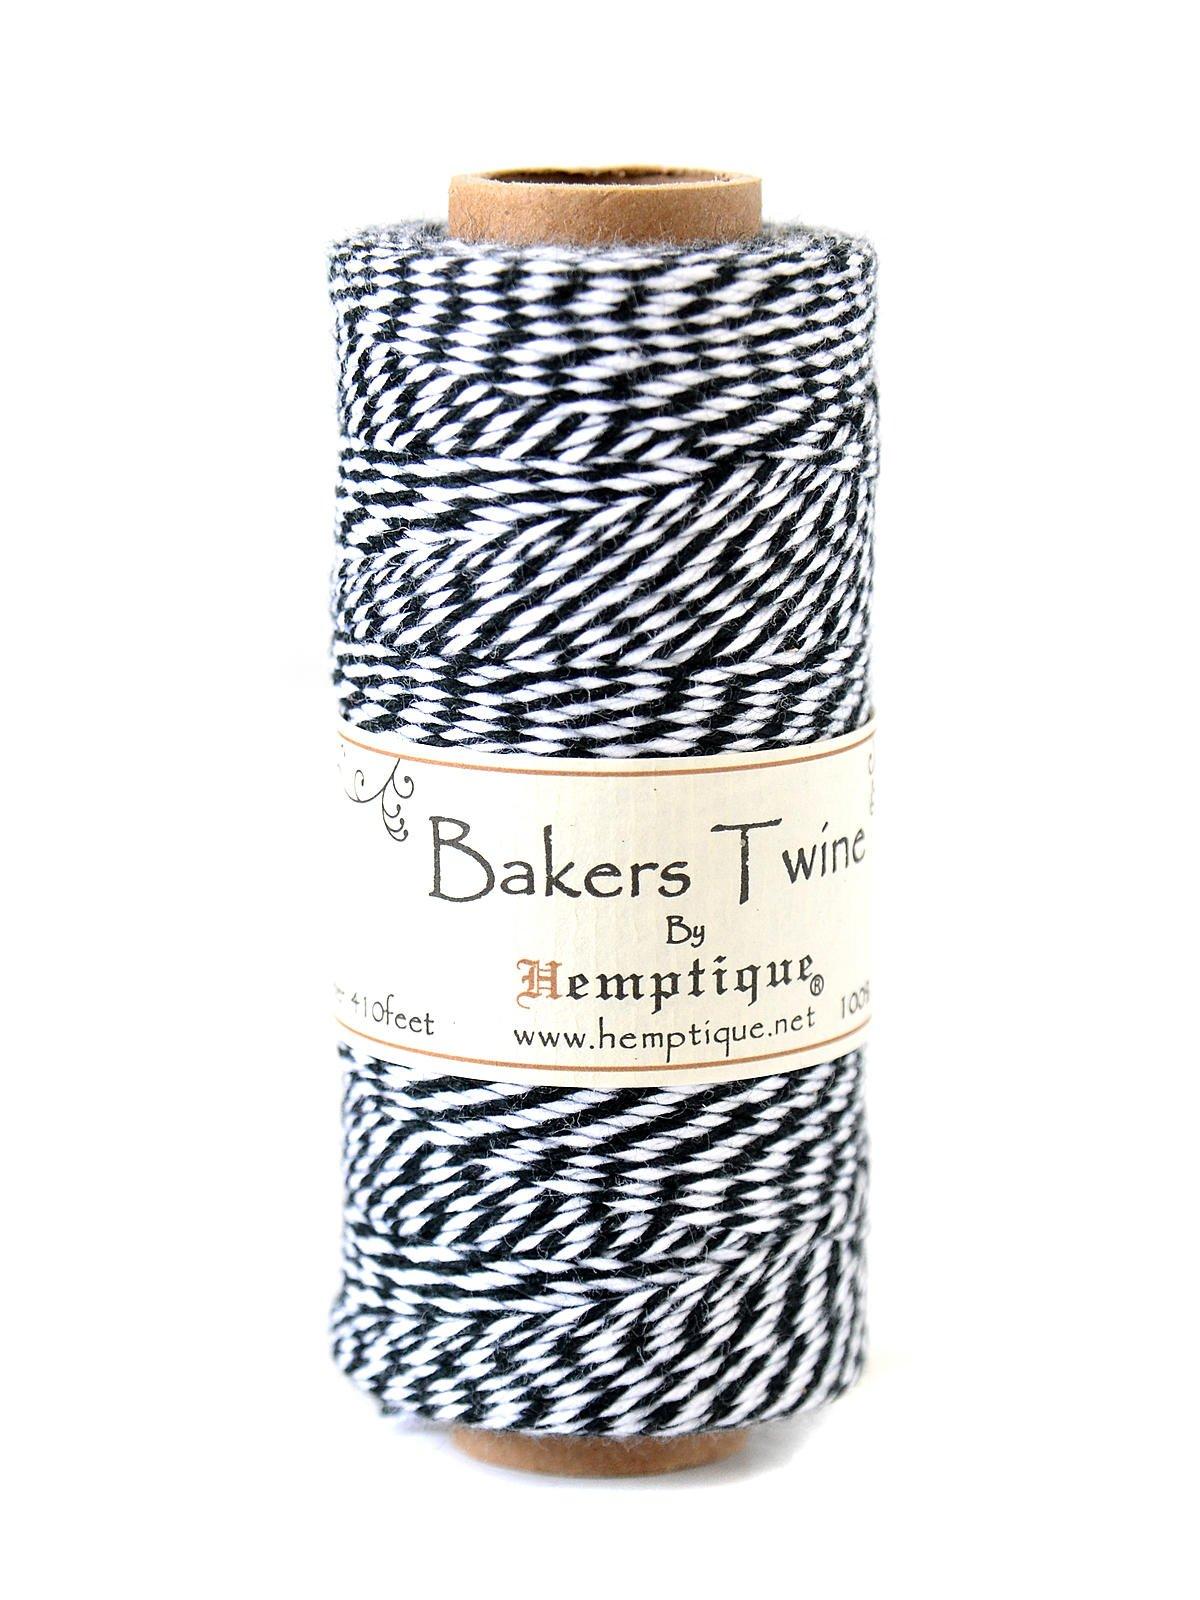 Hemptique Bakers Twine Spools cotton 410 ft. black/white [PACK OF 6 ]